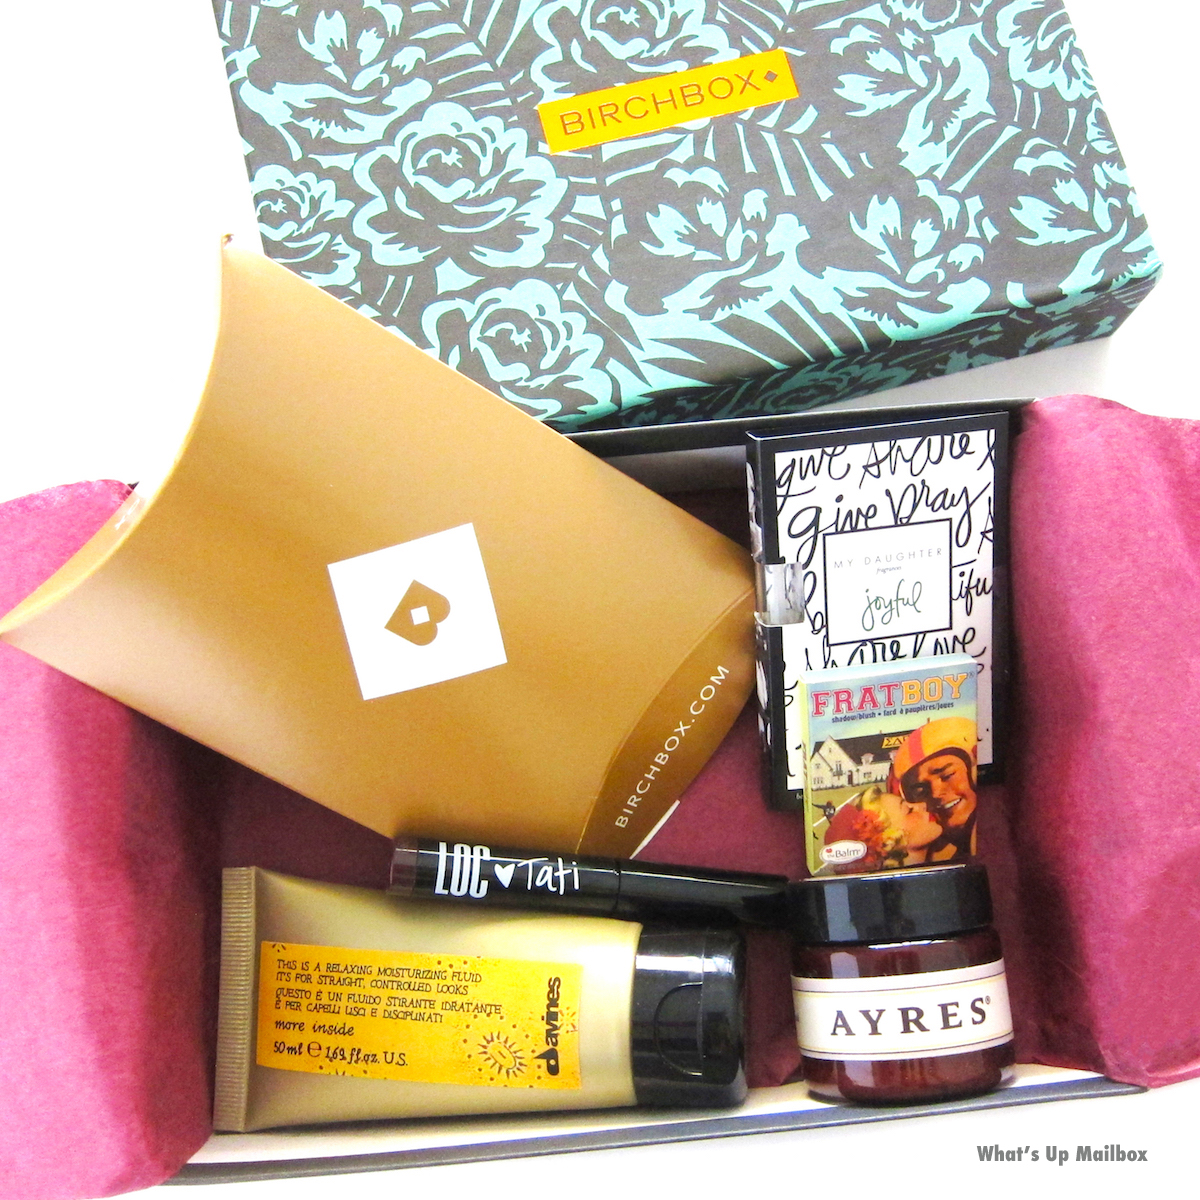 Birchbox Mystery Box GWP